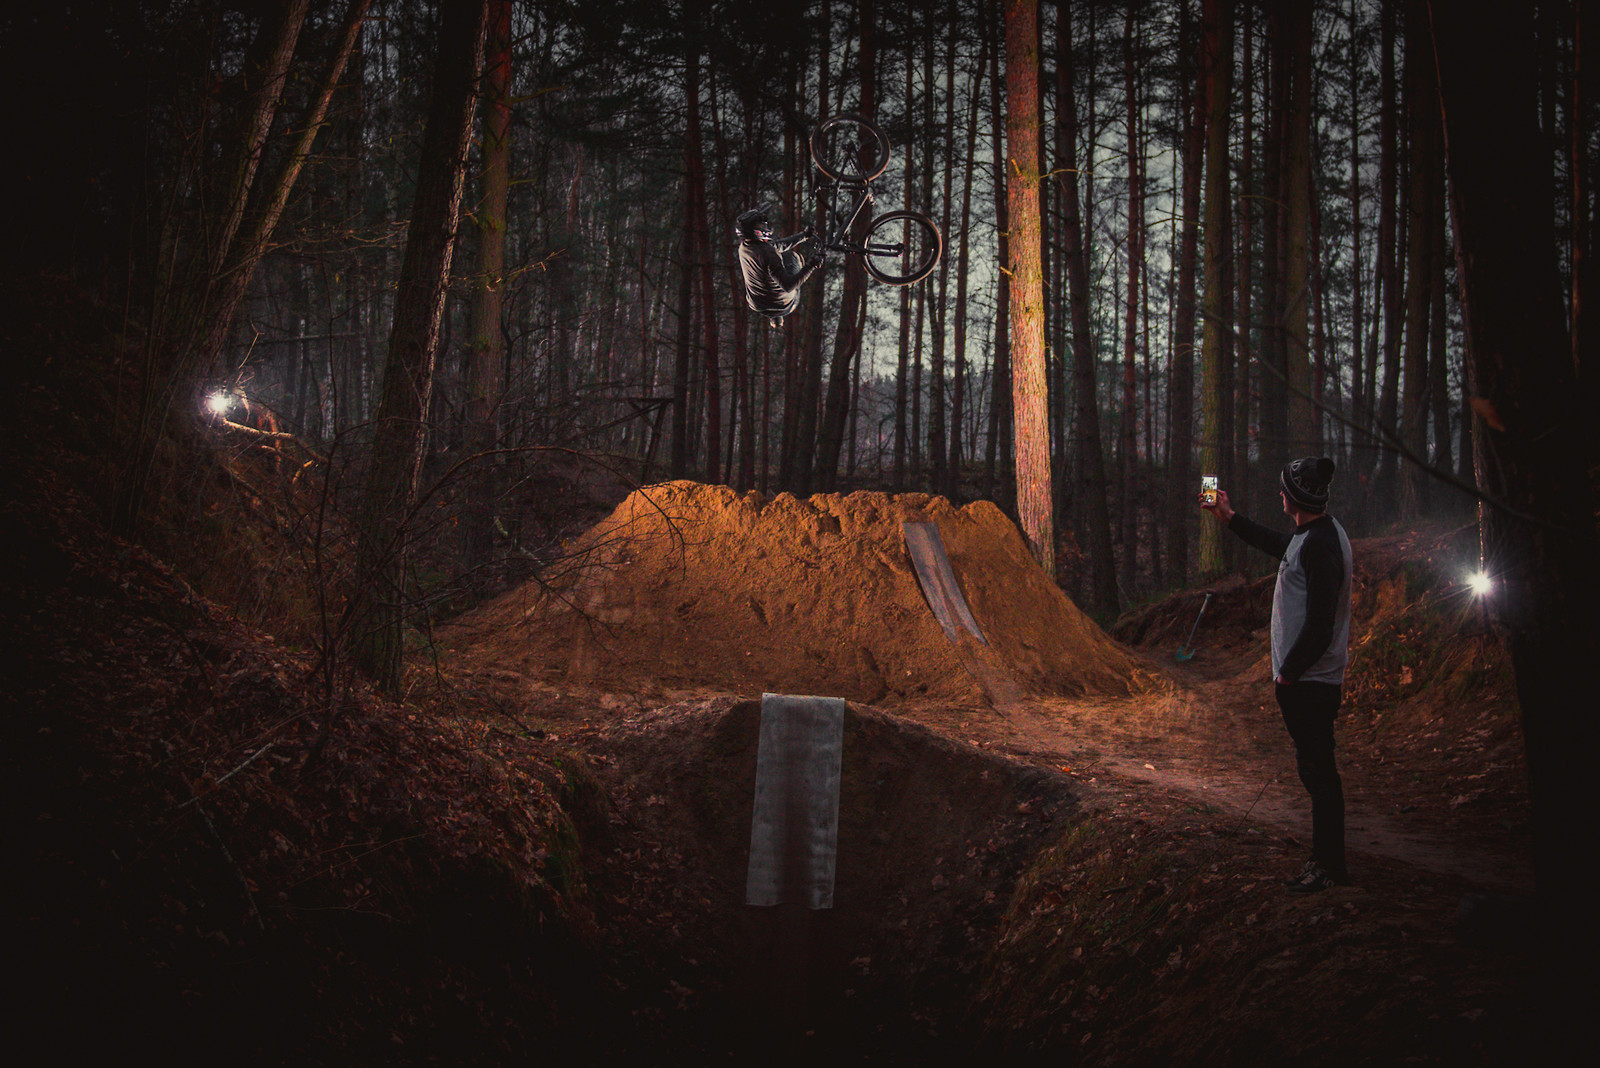 Flipwhip - Adam_GLosowic - Mountain Biking Pictures - Vital MTB